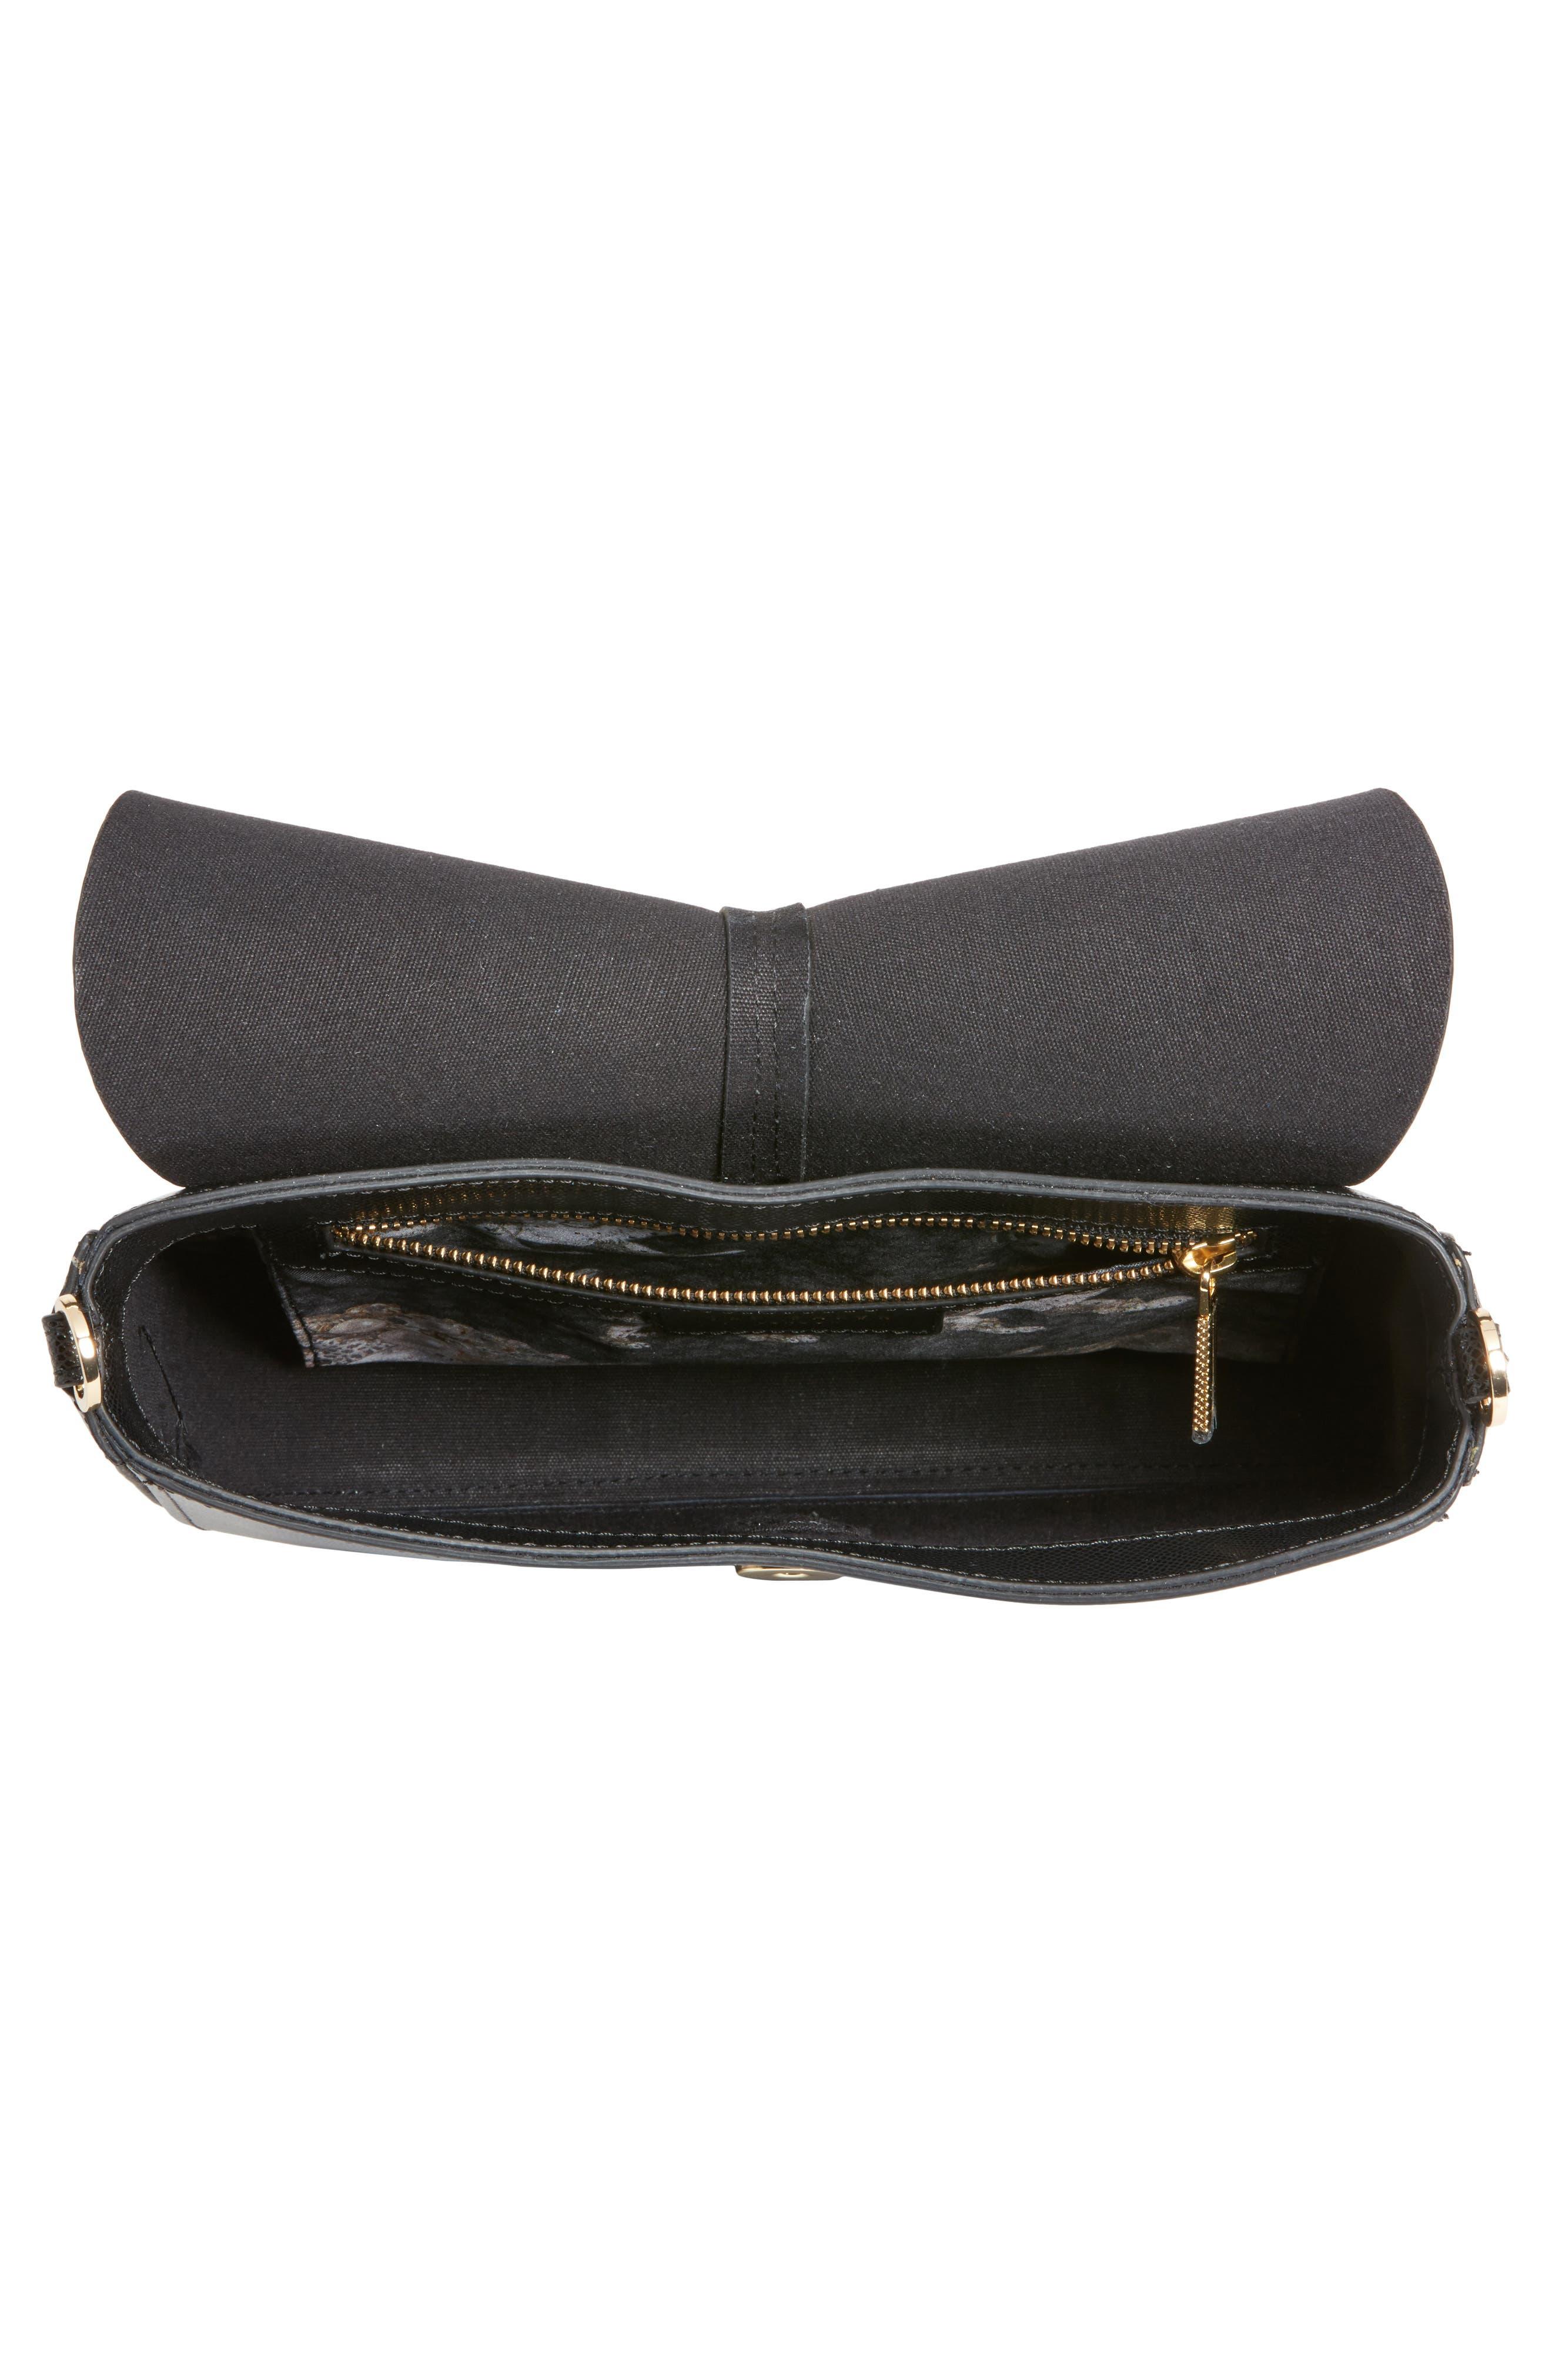 Kittii Cat Leather Crossbody Bag,                             Alternate thumbnail 4, color,                             001